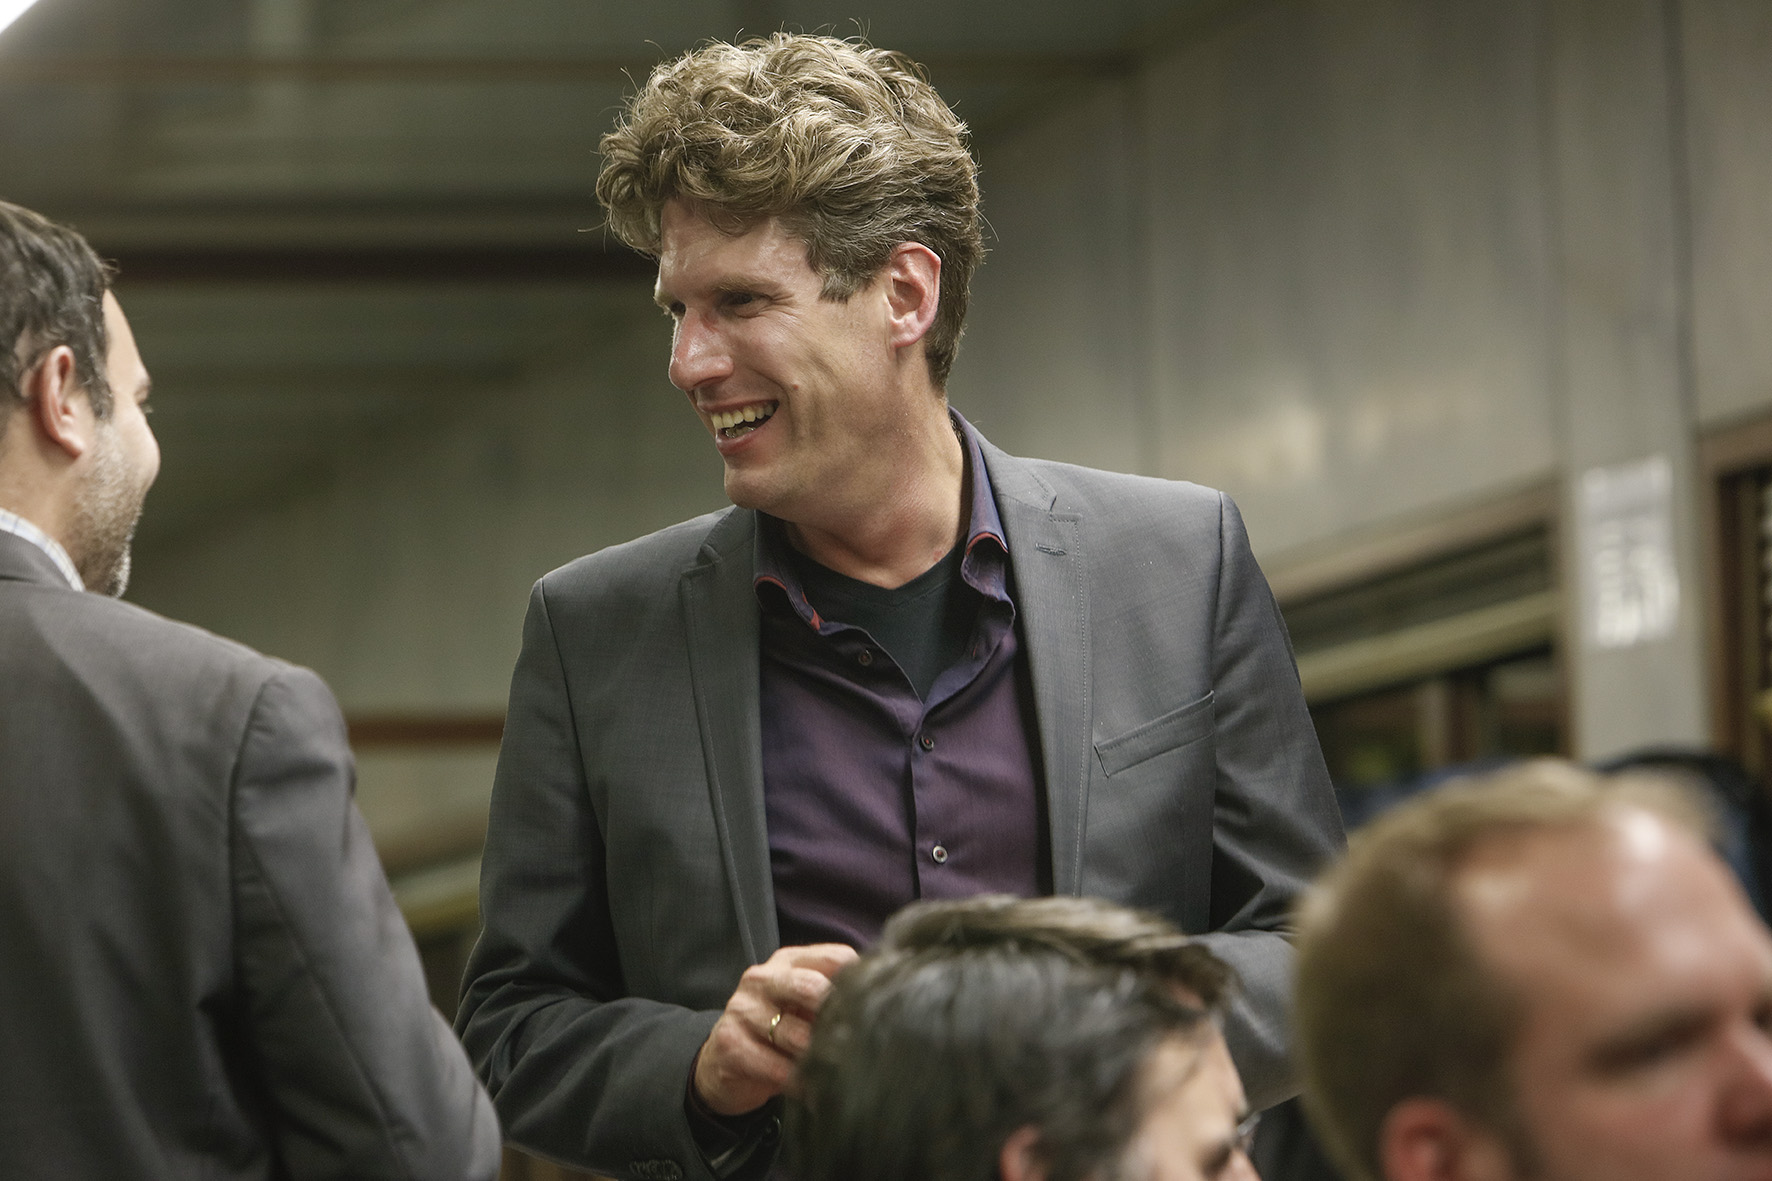 Jan-Willem Wesselink, auteur op Kennislab voor Urbanisme